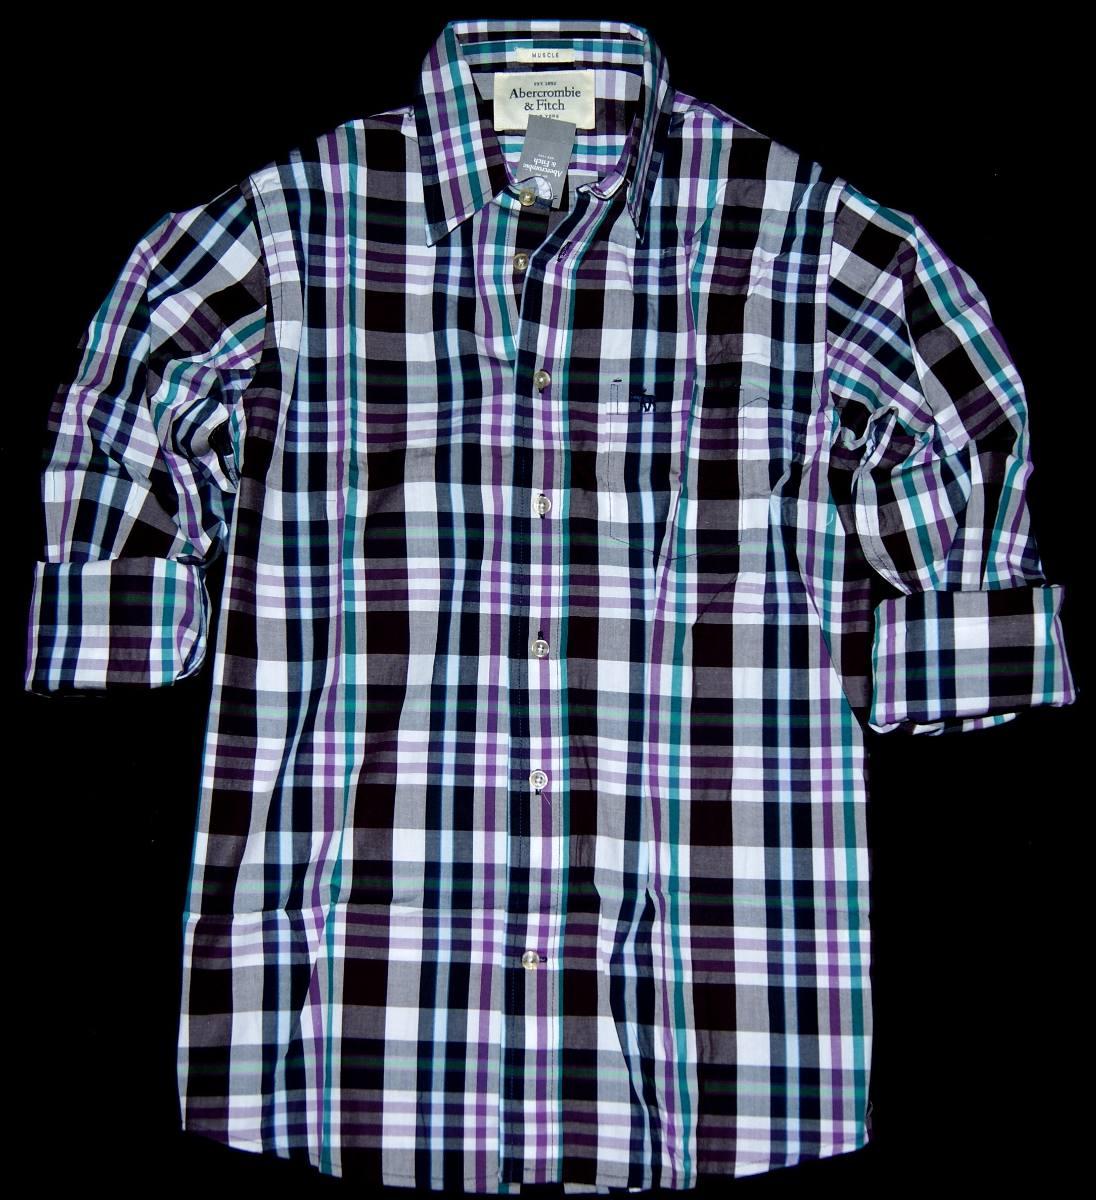 Camisas Abercrombie Al Por Mayor